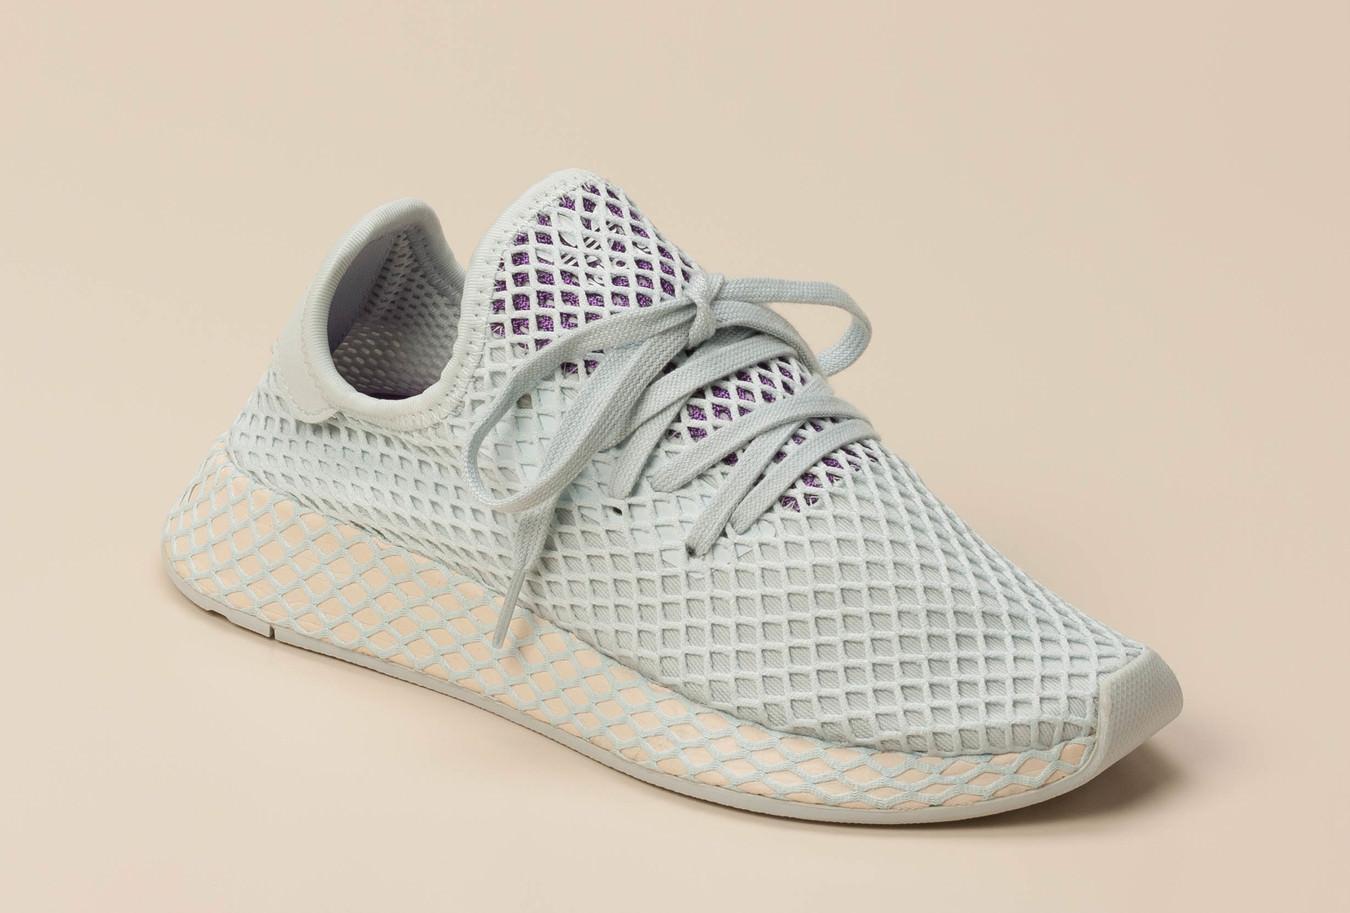 Adidas Damen Sneaker in hellblau kaufen   Zumnorde Online Shop